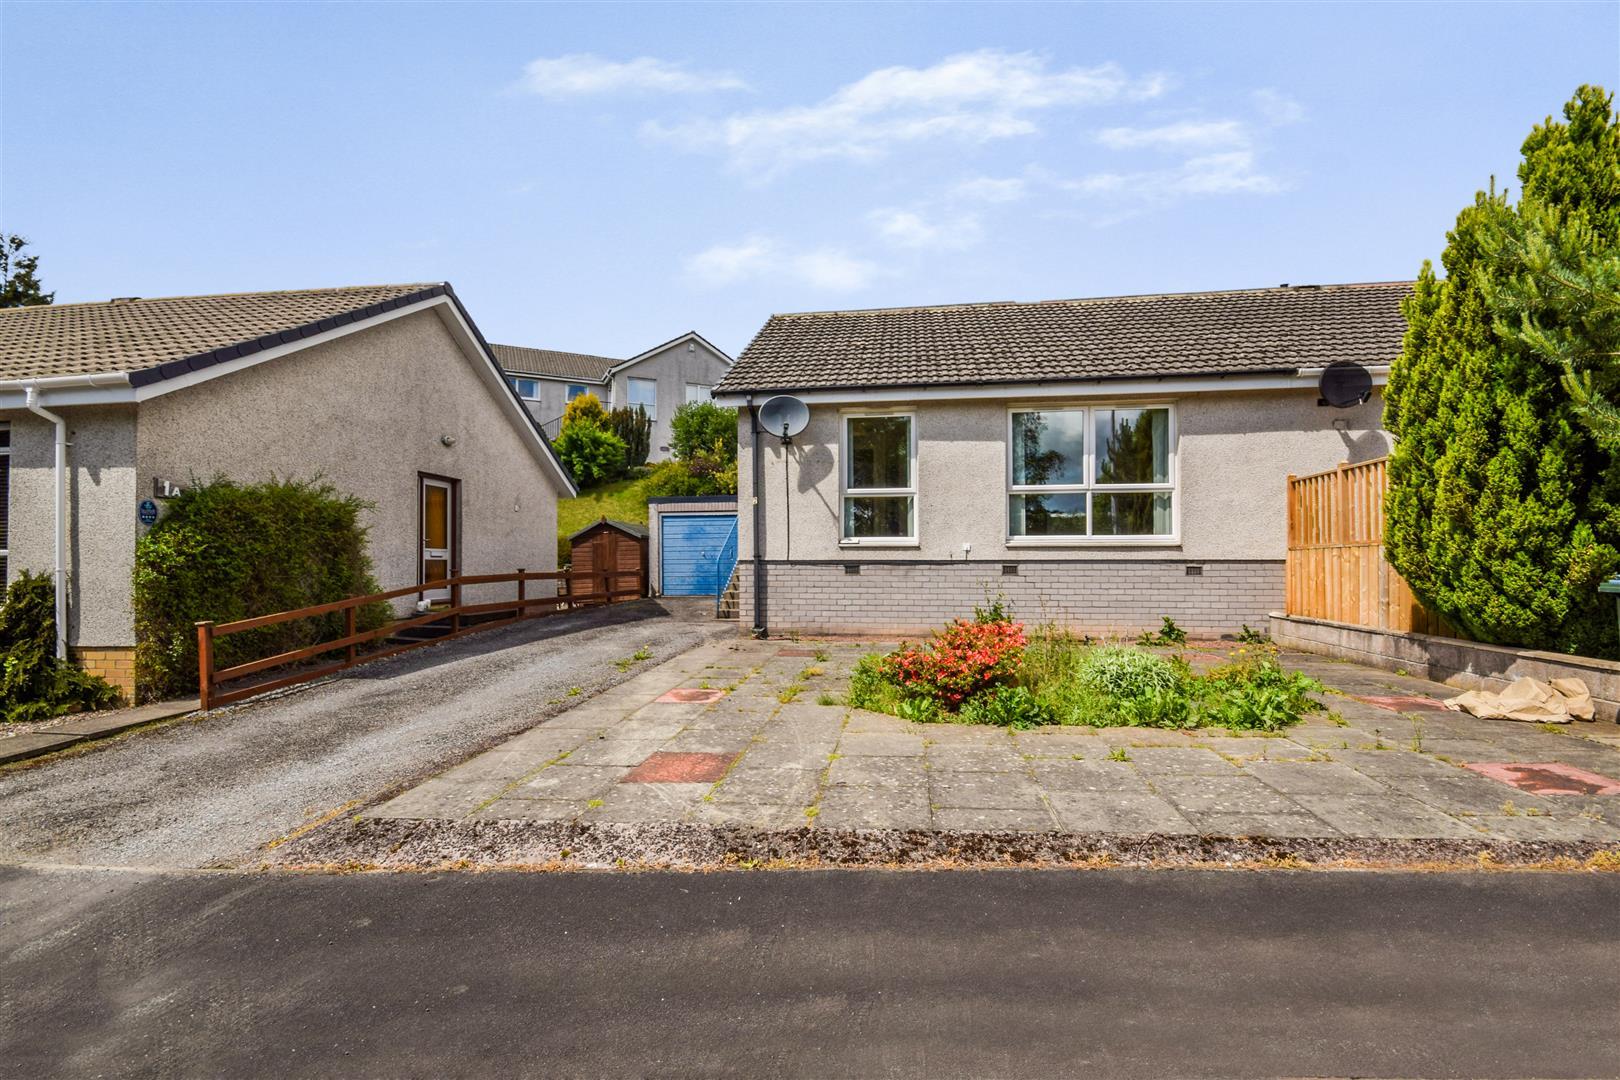 2, Robertson Crescent, Pitlochry, Perthshire, PH16 5HD, UK